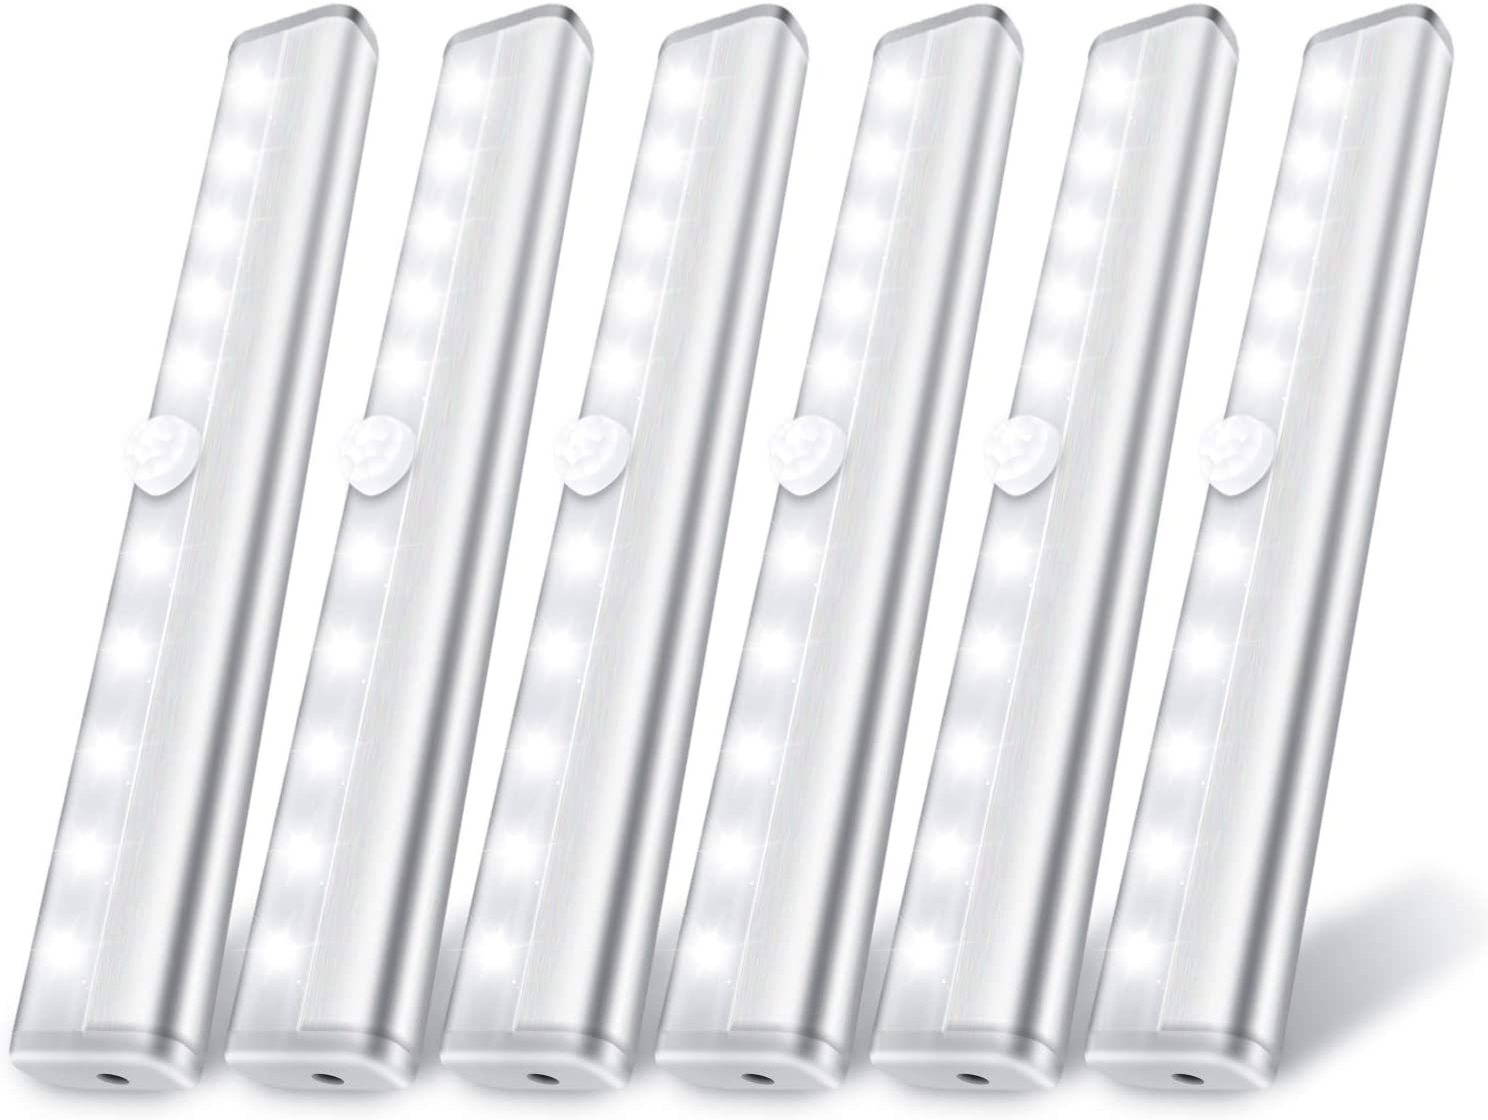 3-6x LED PIR Infrared Motion Sensor Wireless Night Lights Battery Cabinet Lamp